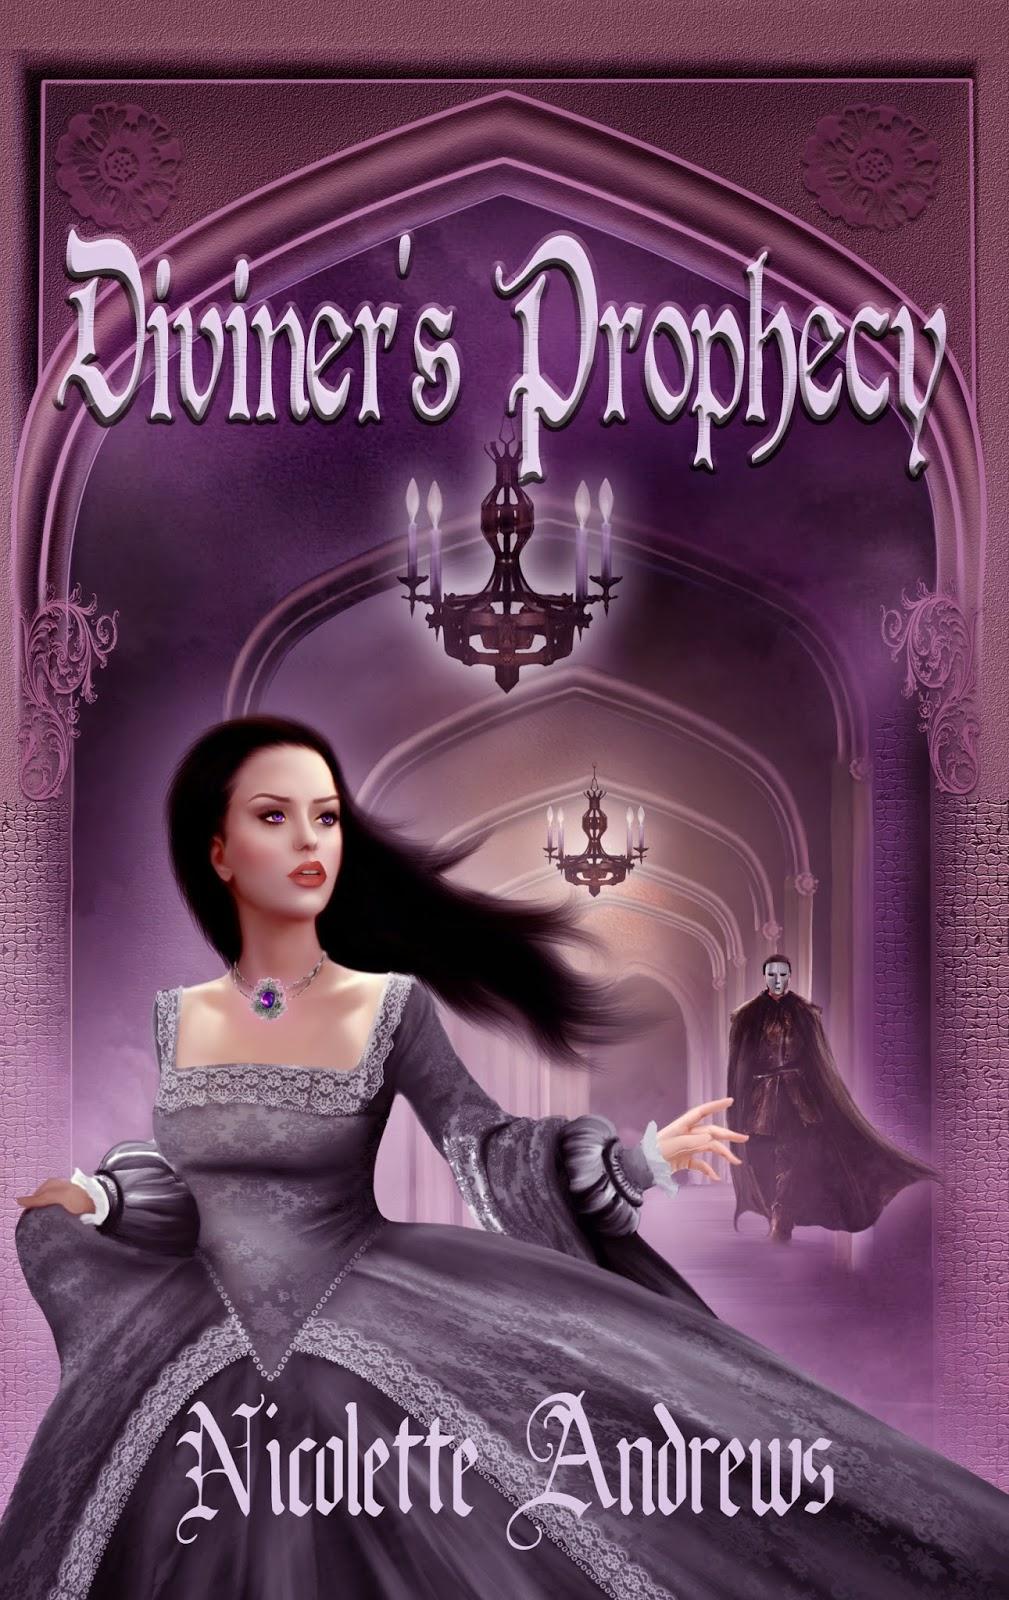 "http://www.amazon.com/gp/offer-listing/B00BRS8LCI/ref=as_li_tf_tl?ie=UTF8&camp=1789&creative=9325&creativeASIN=B00BRS8LCI&linkCode=am2&tag=chebraautpag-20"">Diviner's Prophecy (Diviner's Trilogy Book One)</a><img src=""http://ir-na.amazon-adsystem.com/e/ir?t=chebraautpag-20"